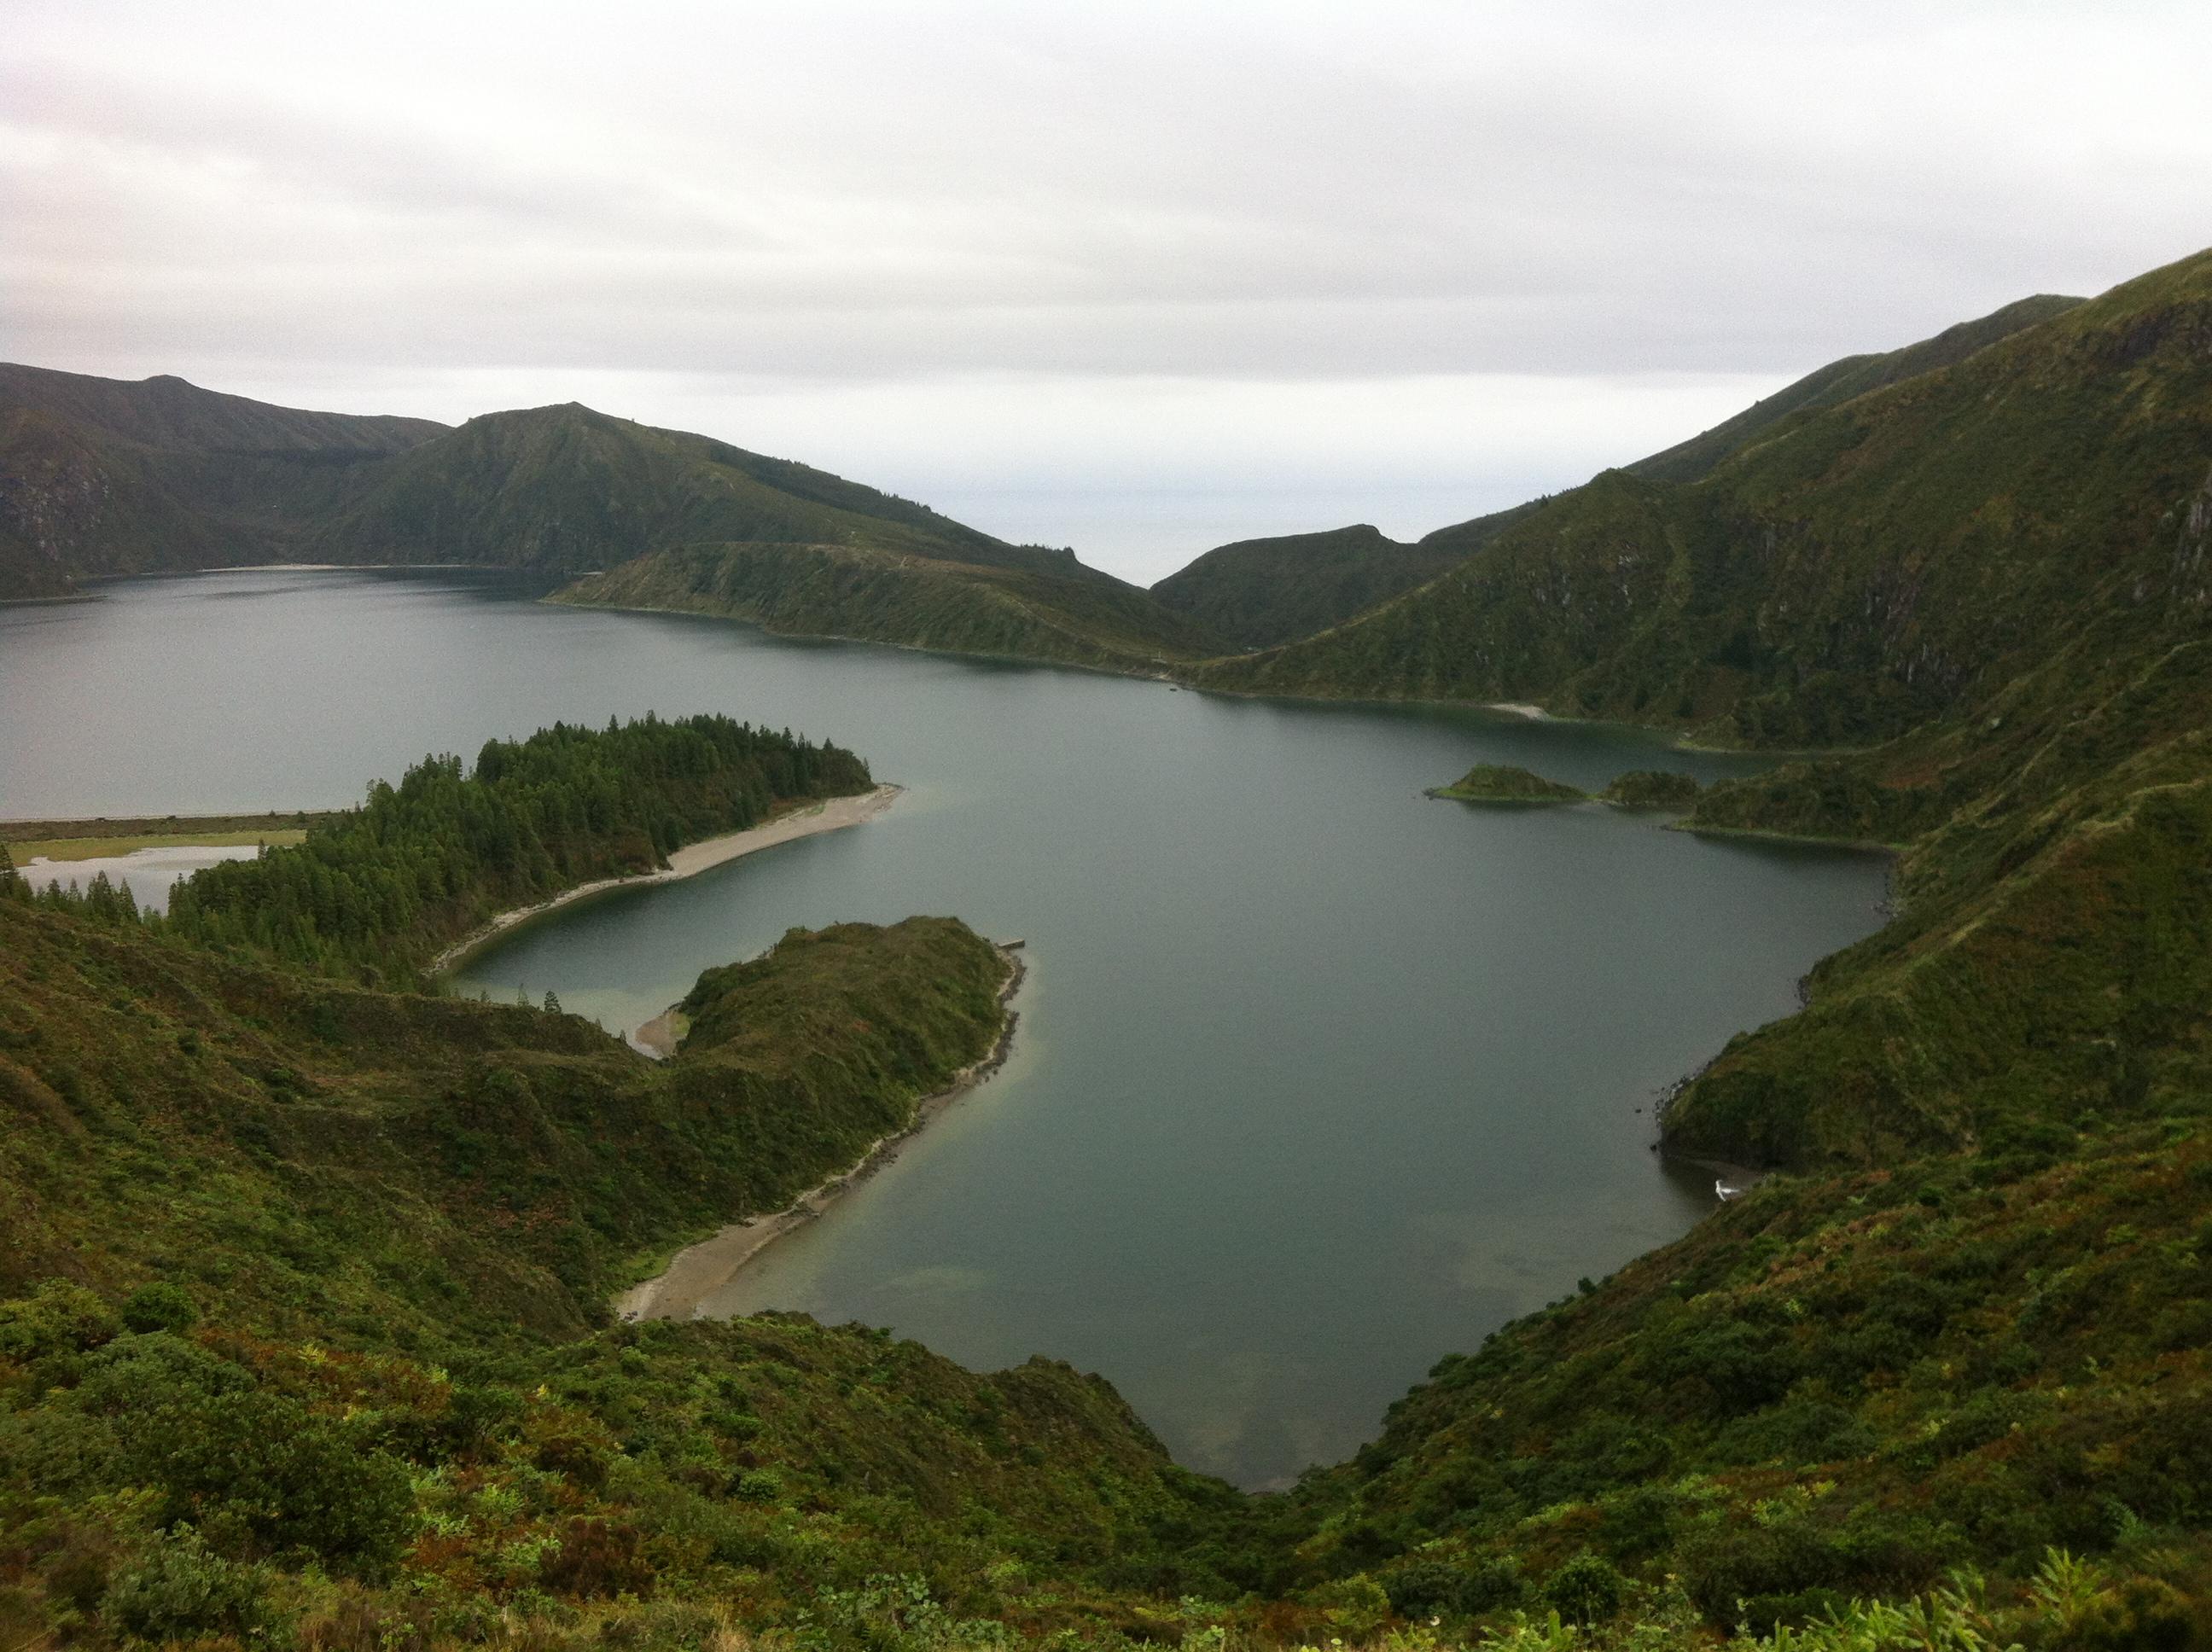 Fogo Caldera, Azores